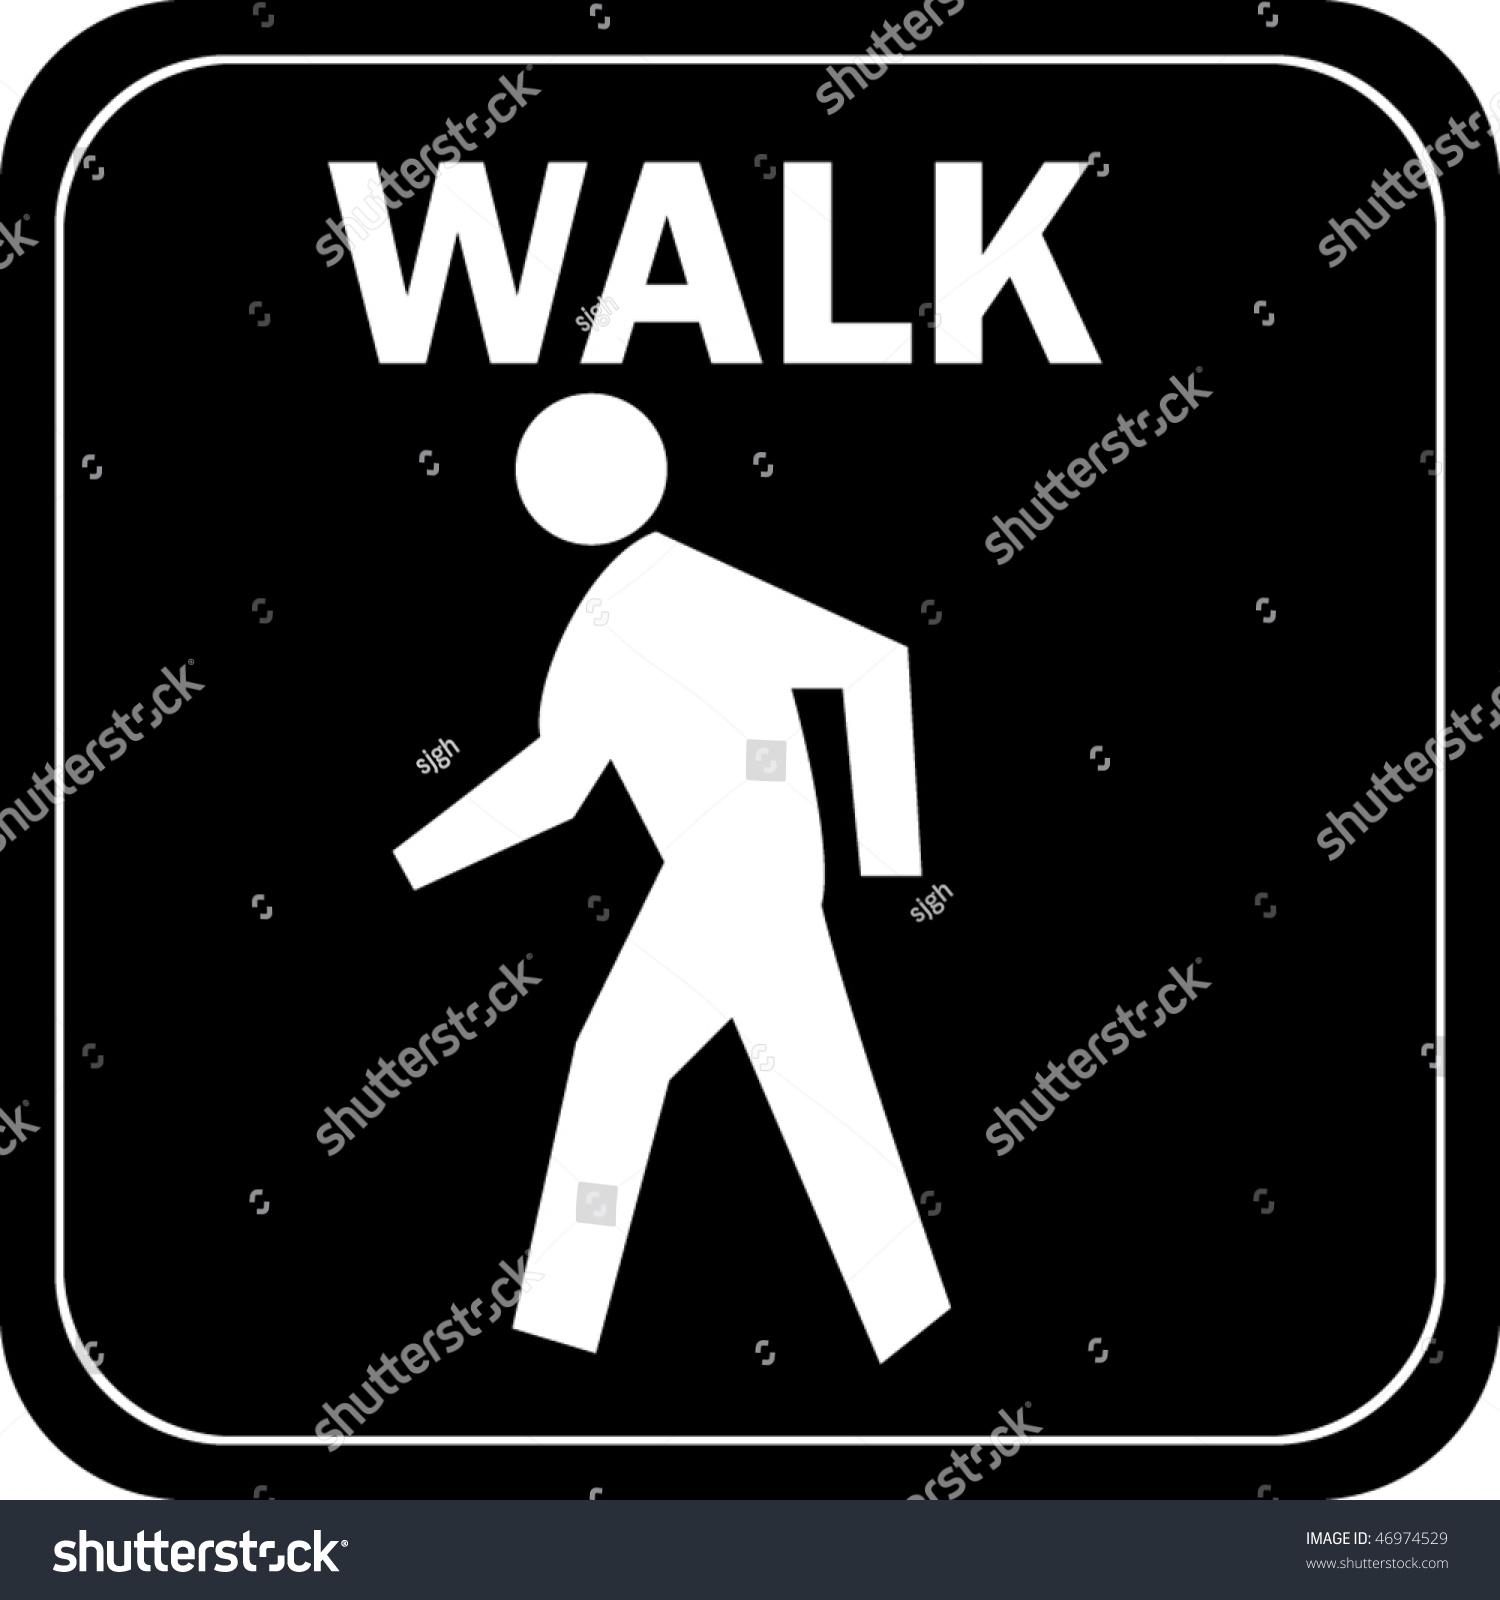 Http Www Shutterstock Com Pic 46974529 Stock Vector Walk Sign Html